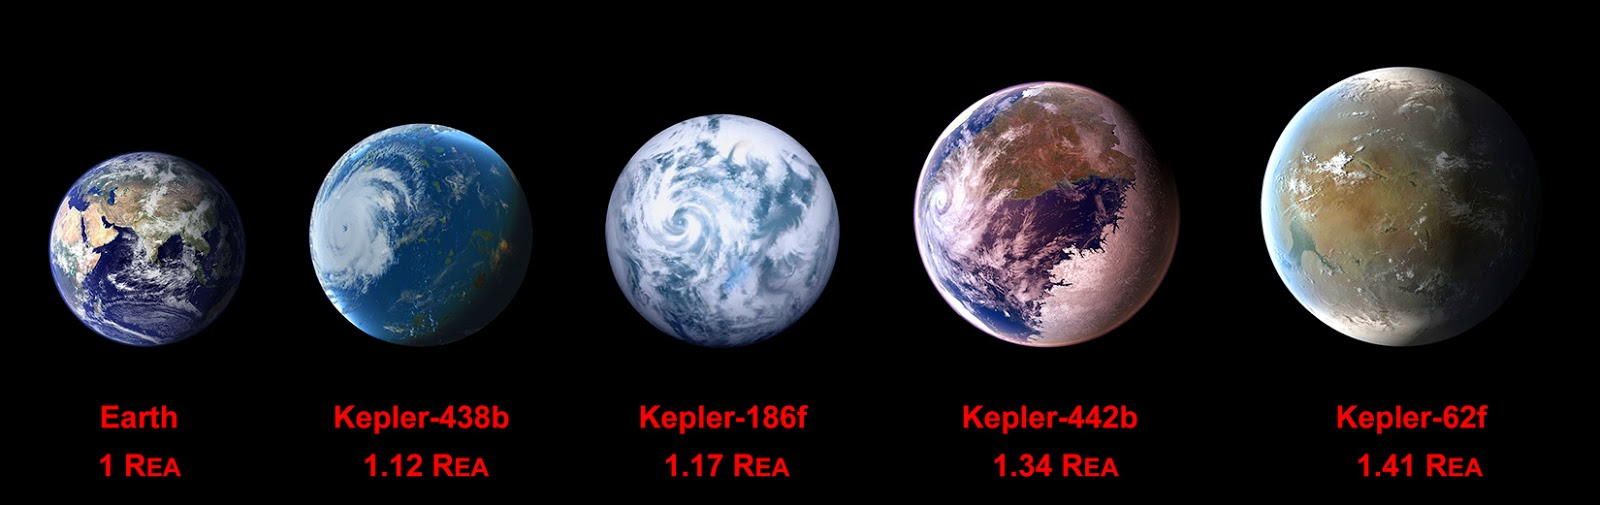 mass radius relationship for solid exo planets nasa